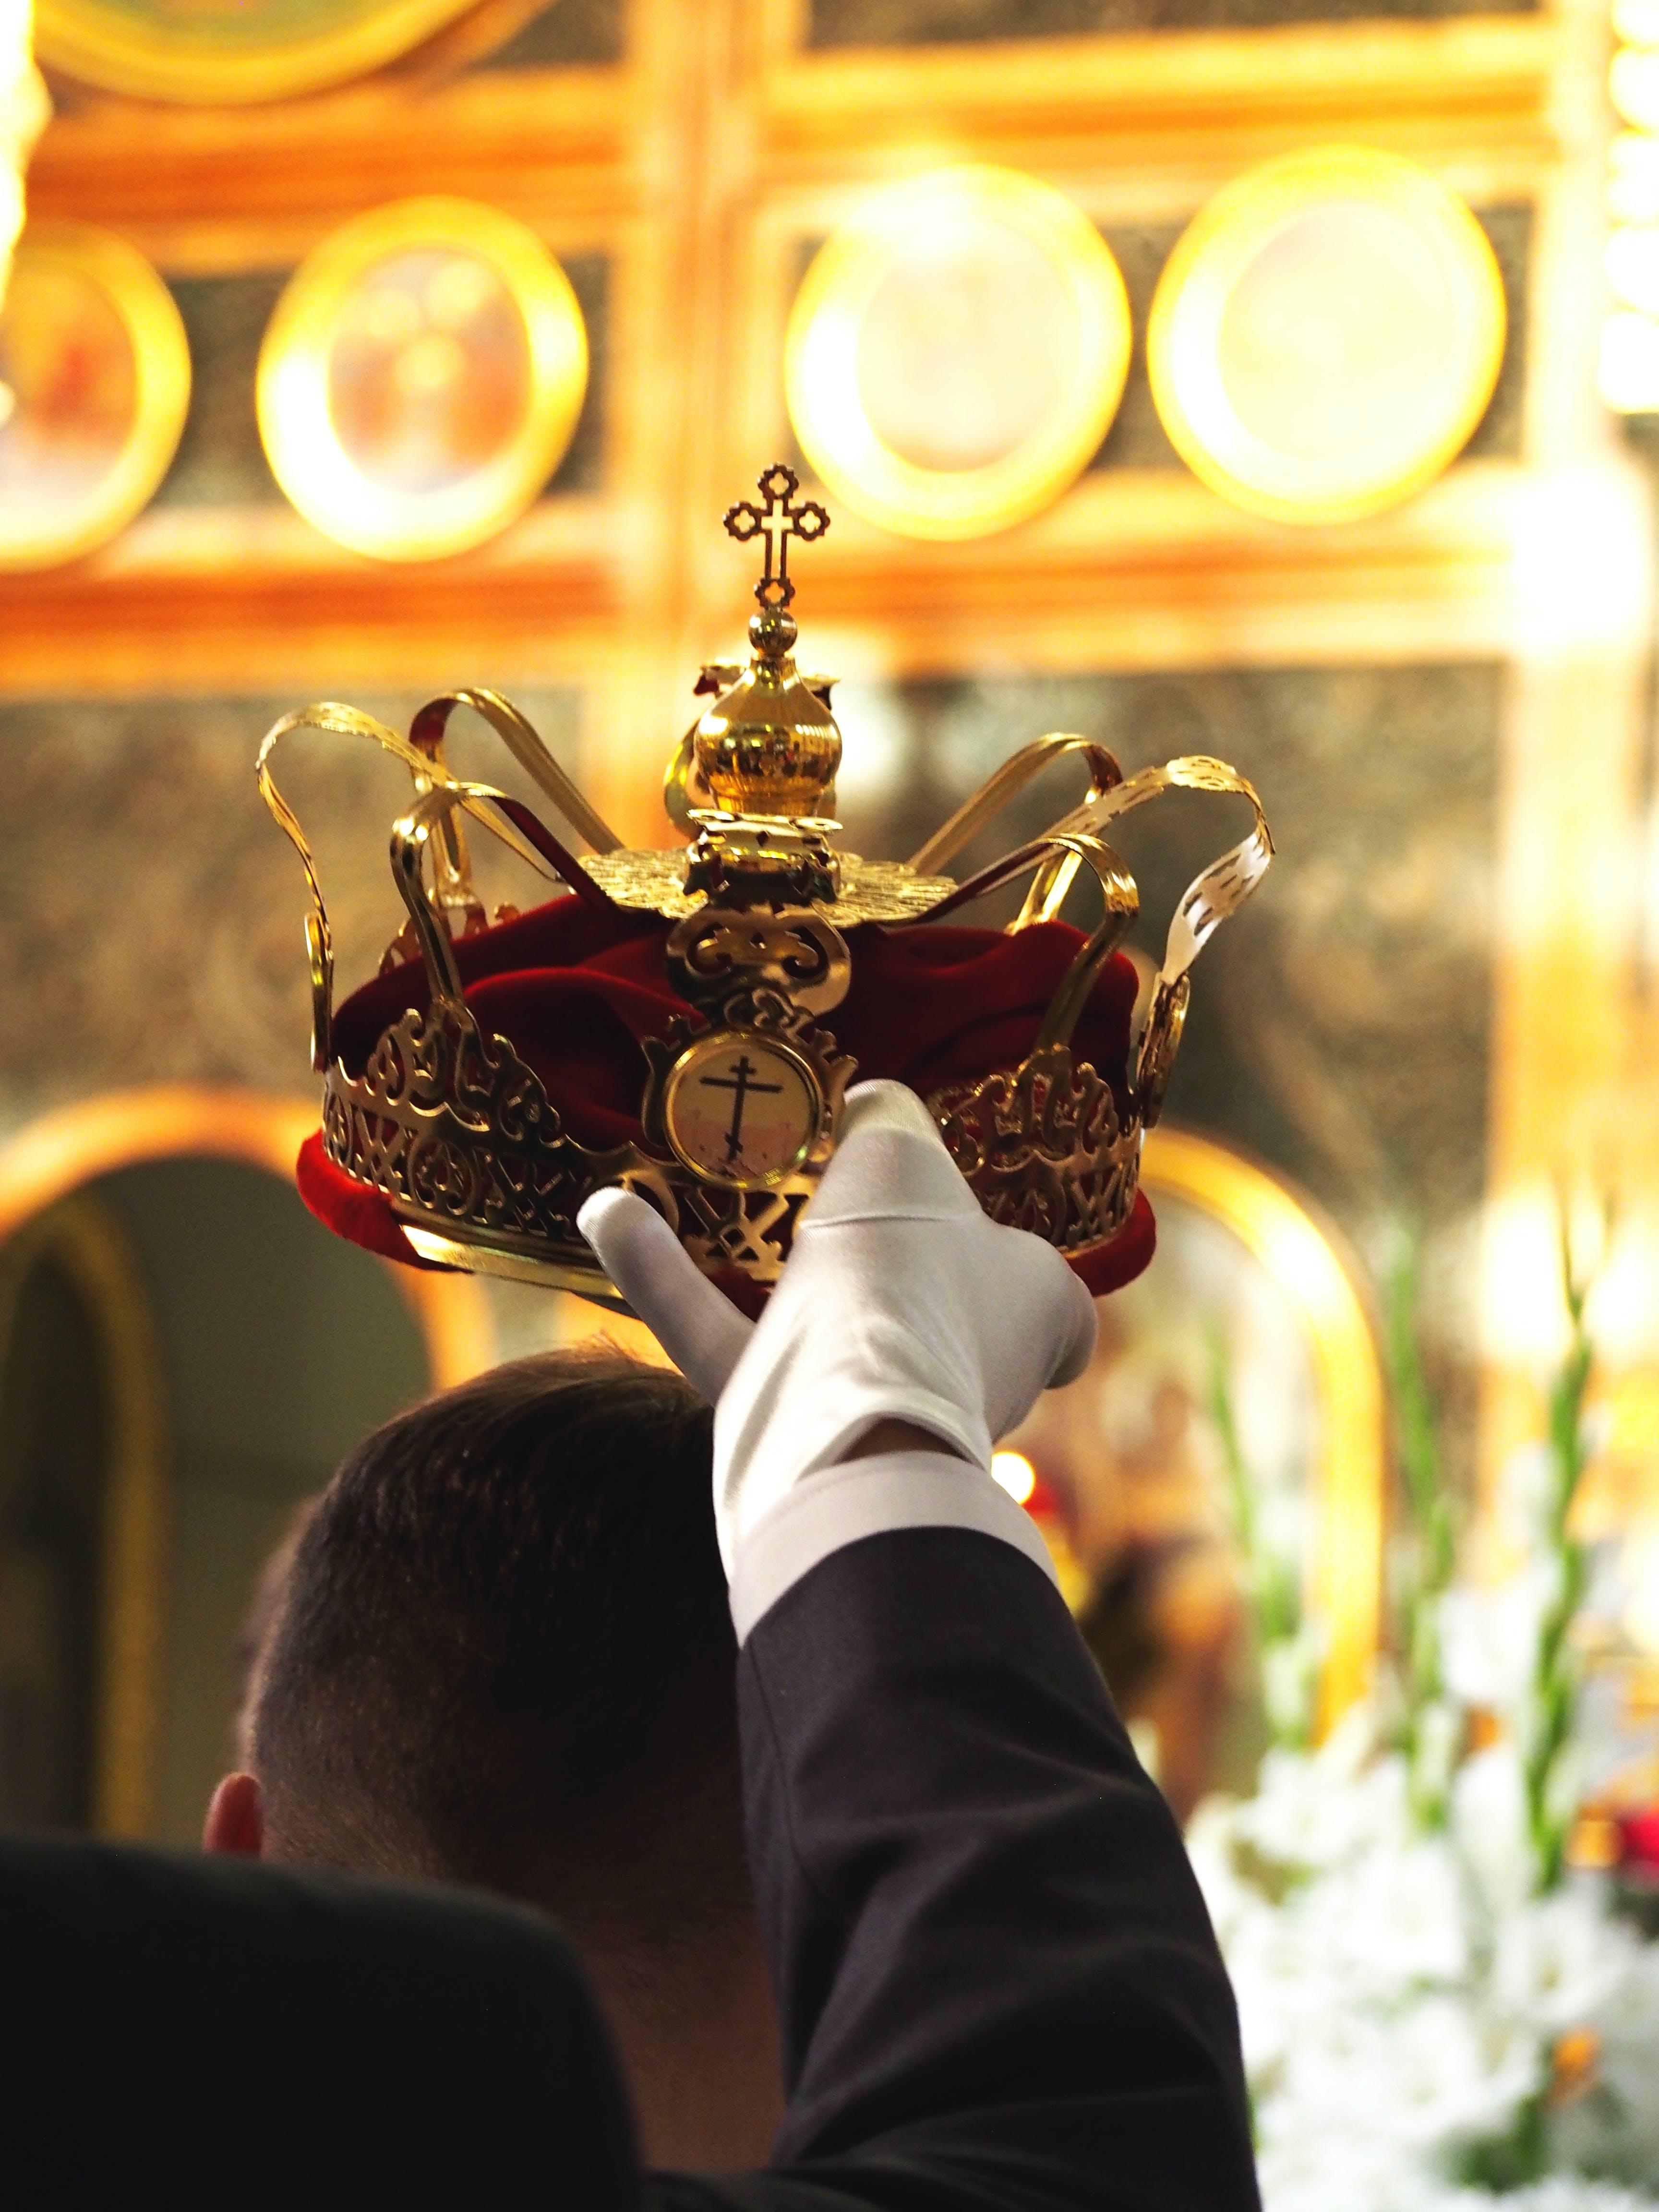 Free stock photo of crown, wedding, tradition, orthodox